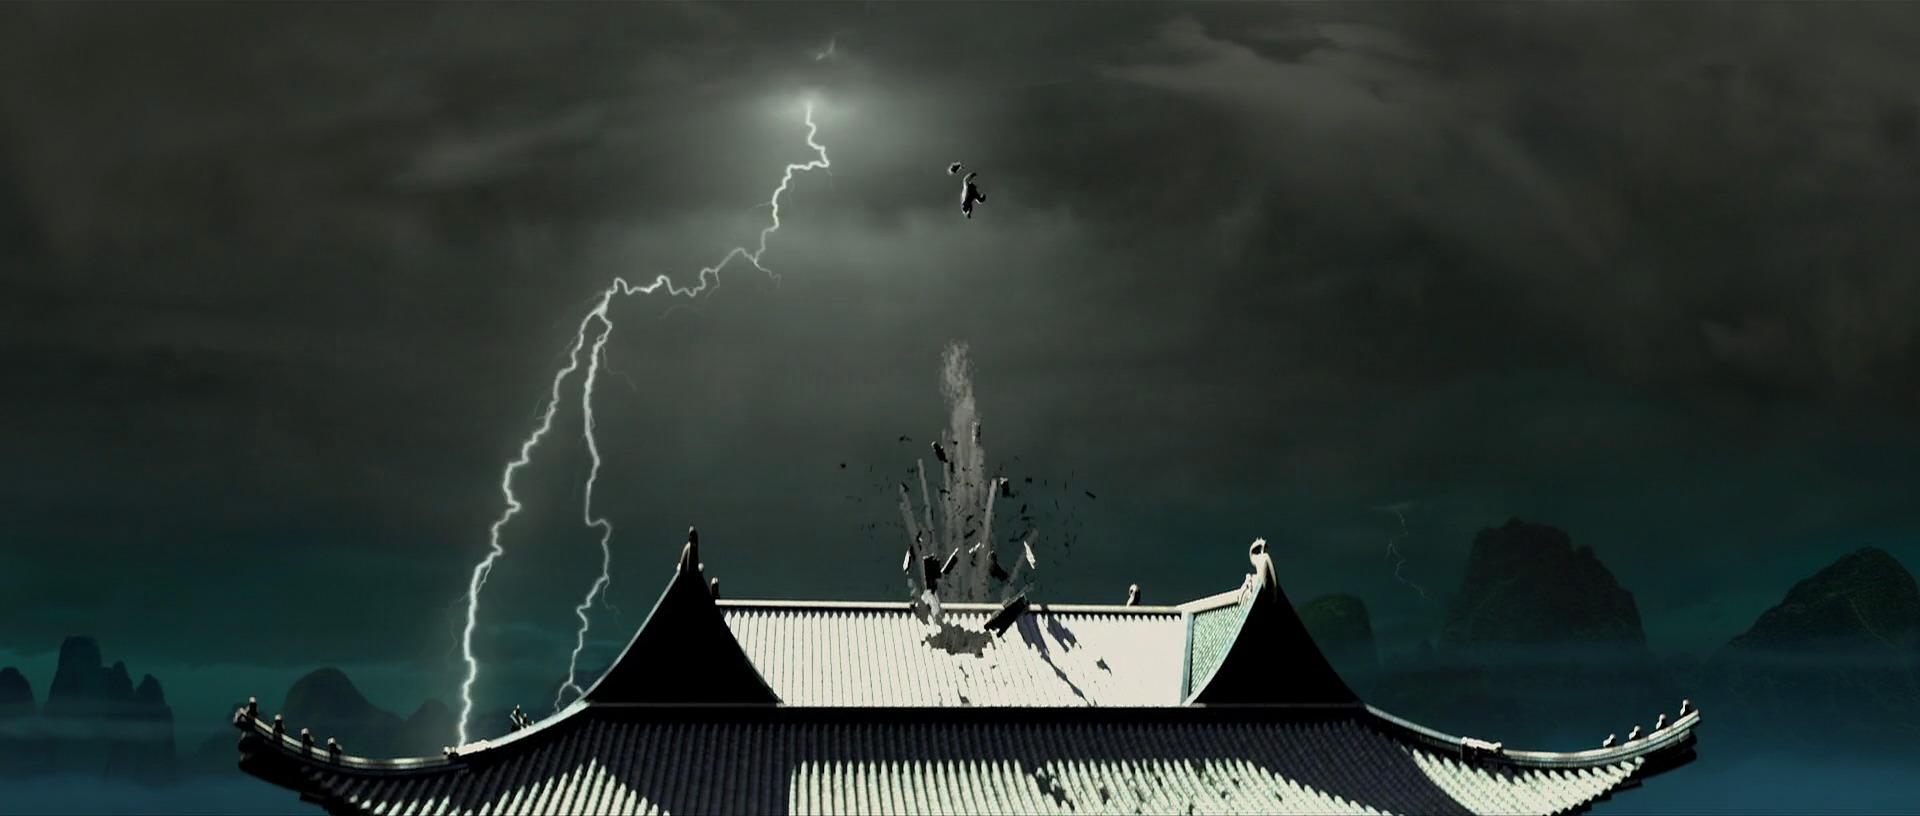 Battle between Shifu and Tai Lung